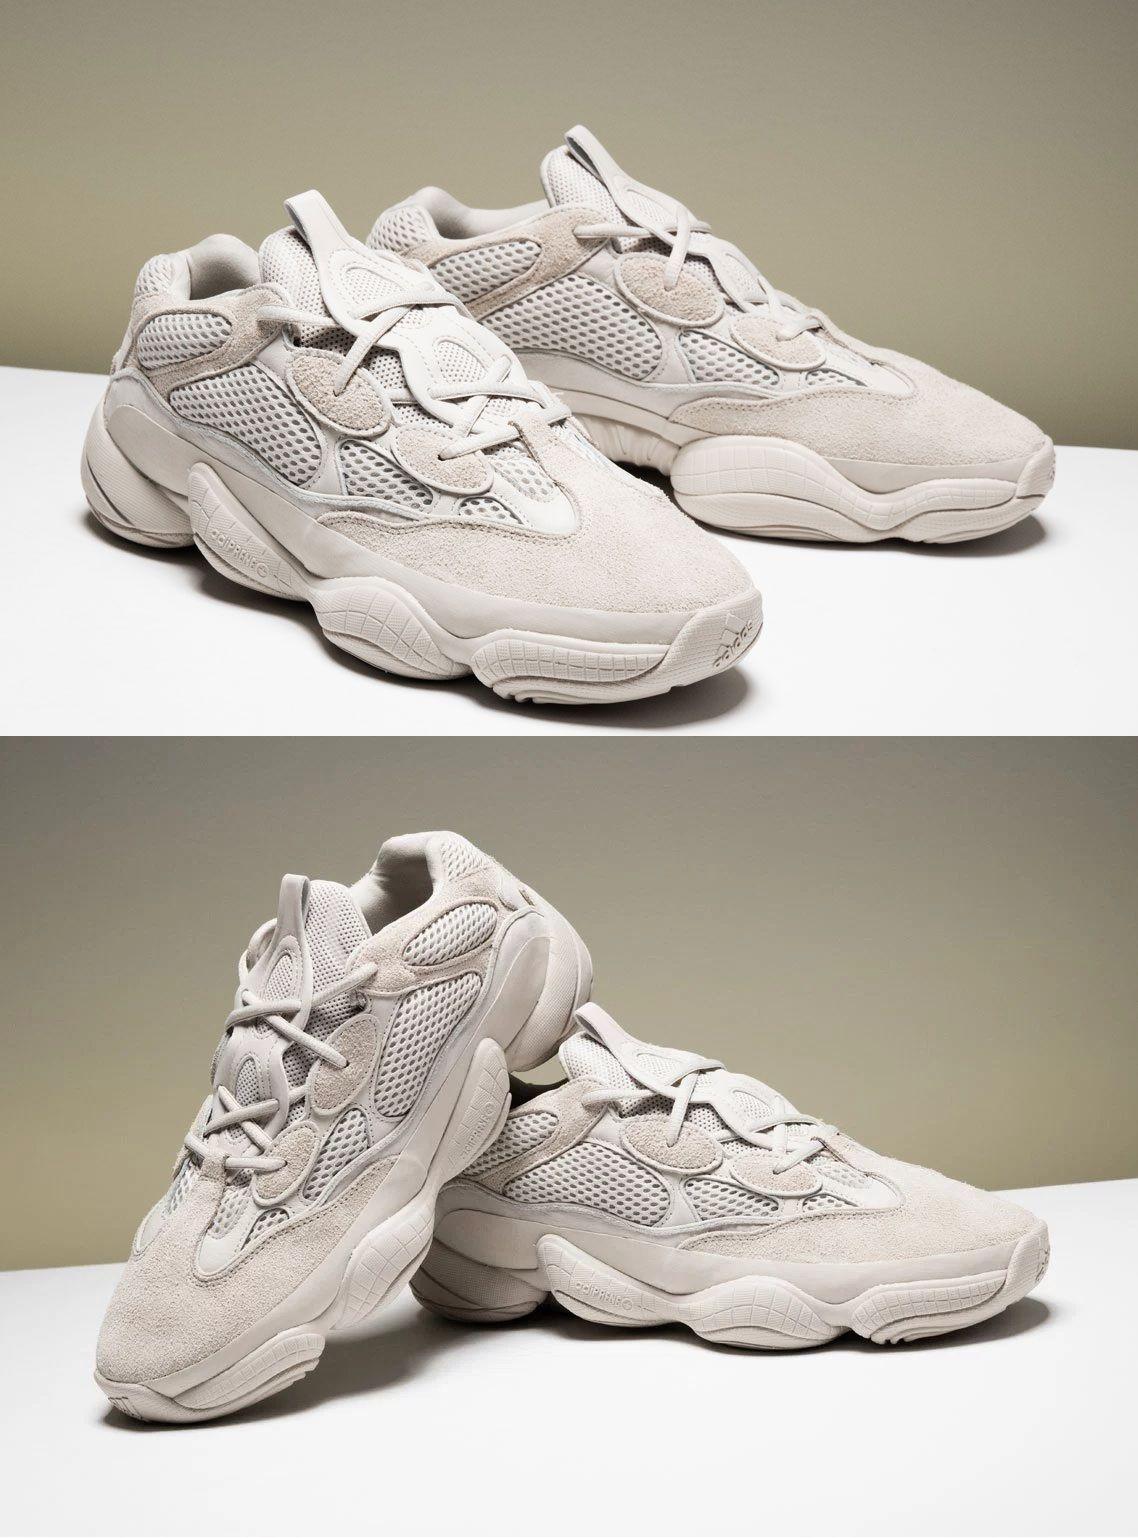 31a11e010c043 adidas Yeezy 500